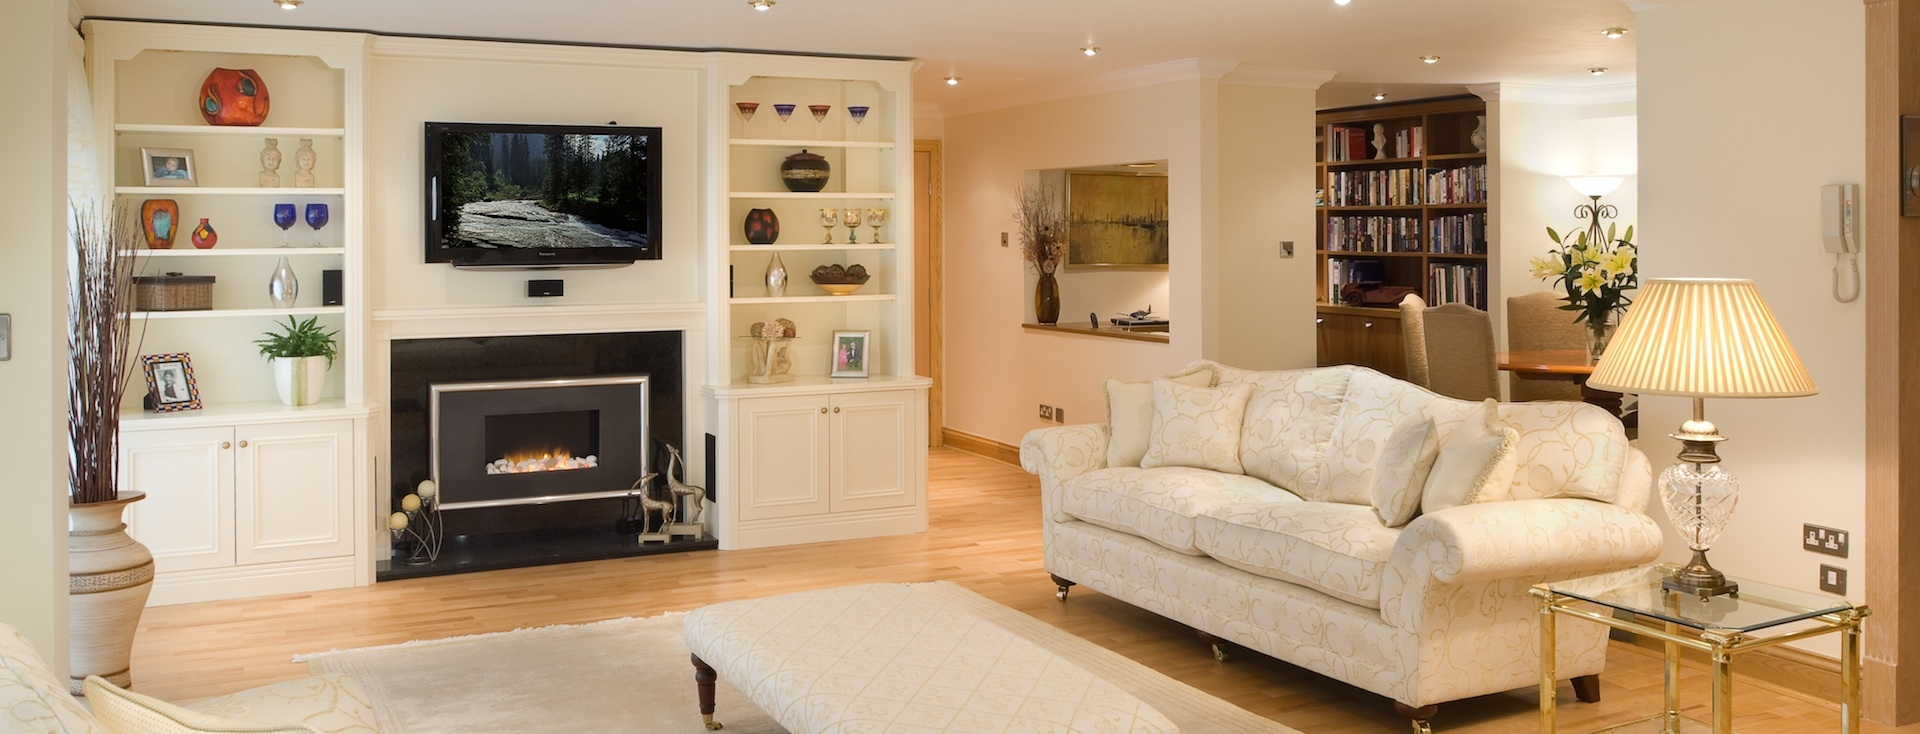 Popular Photo of Bespoke Built In Furniture